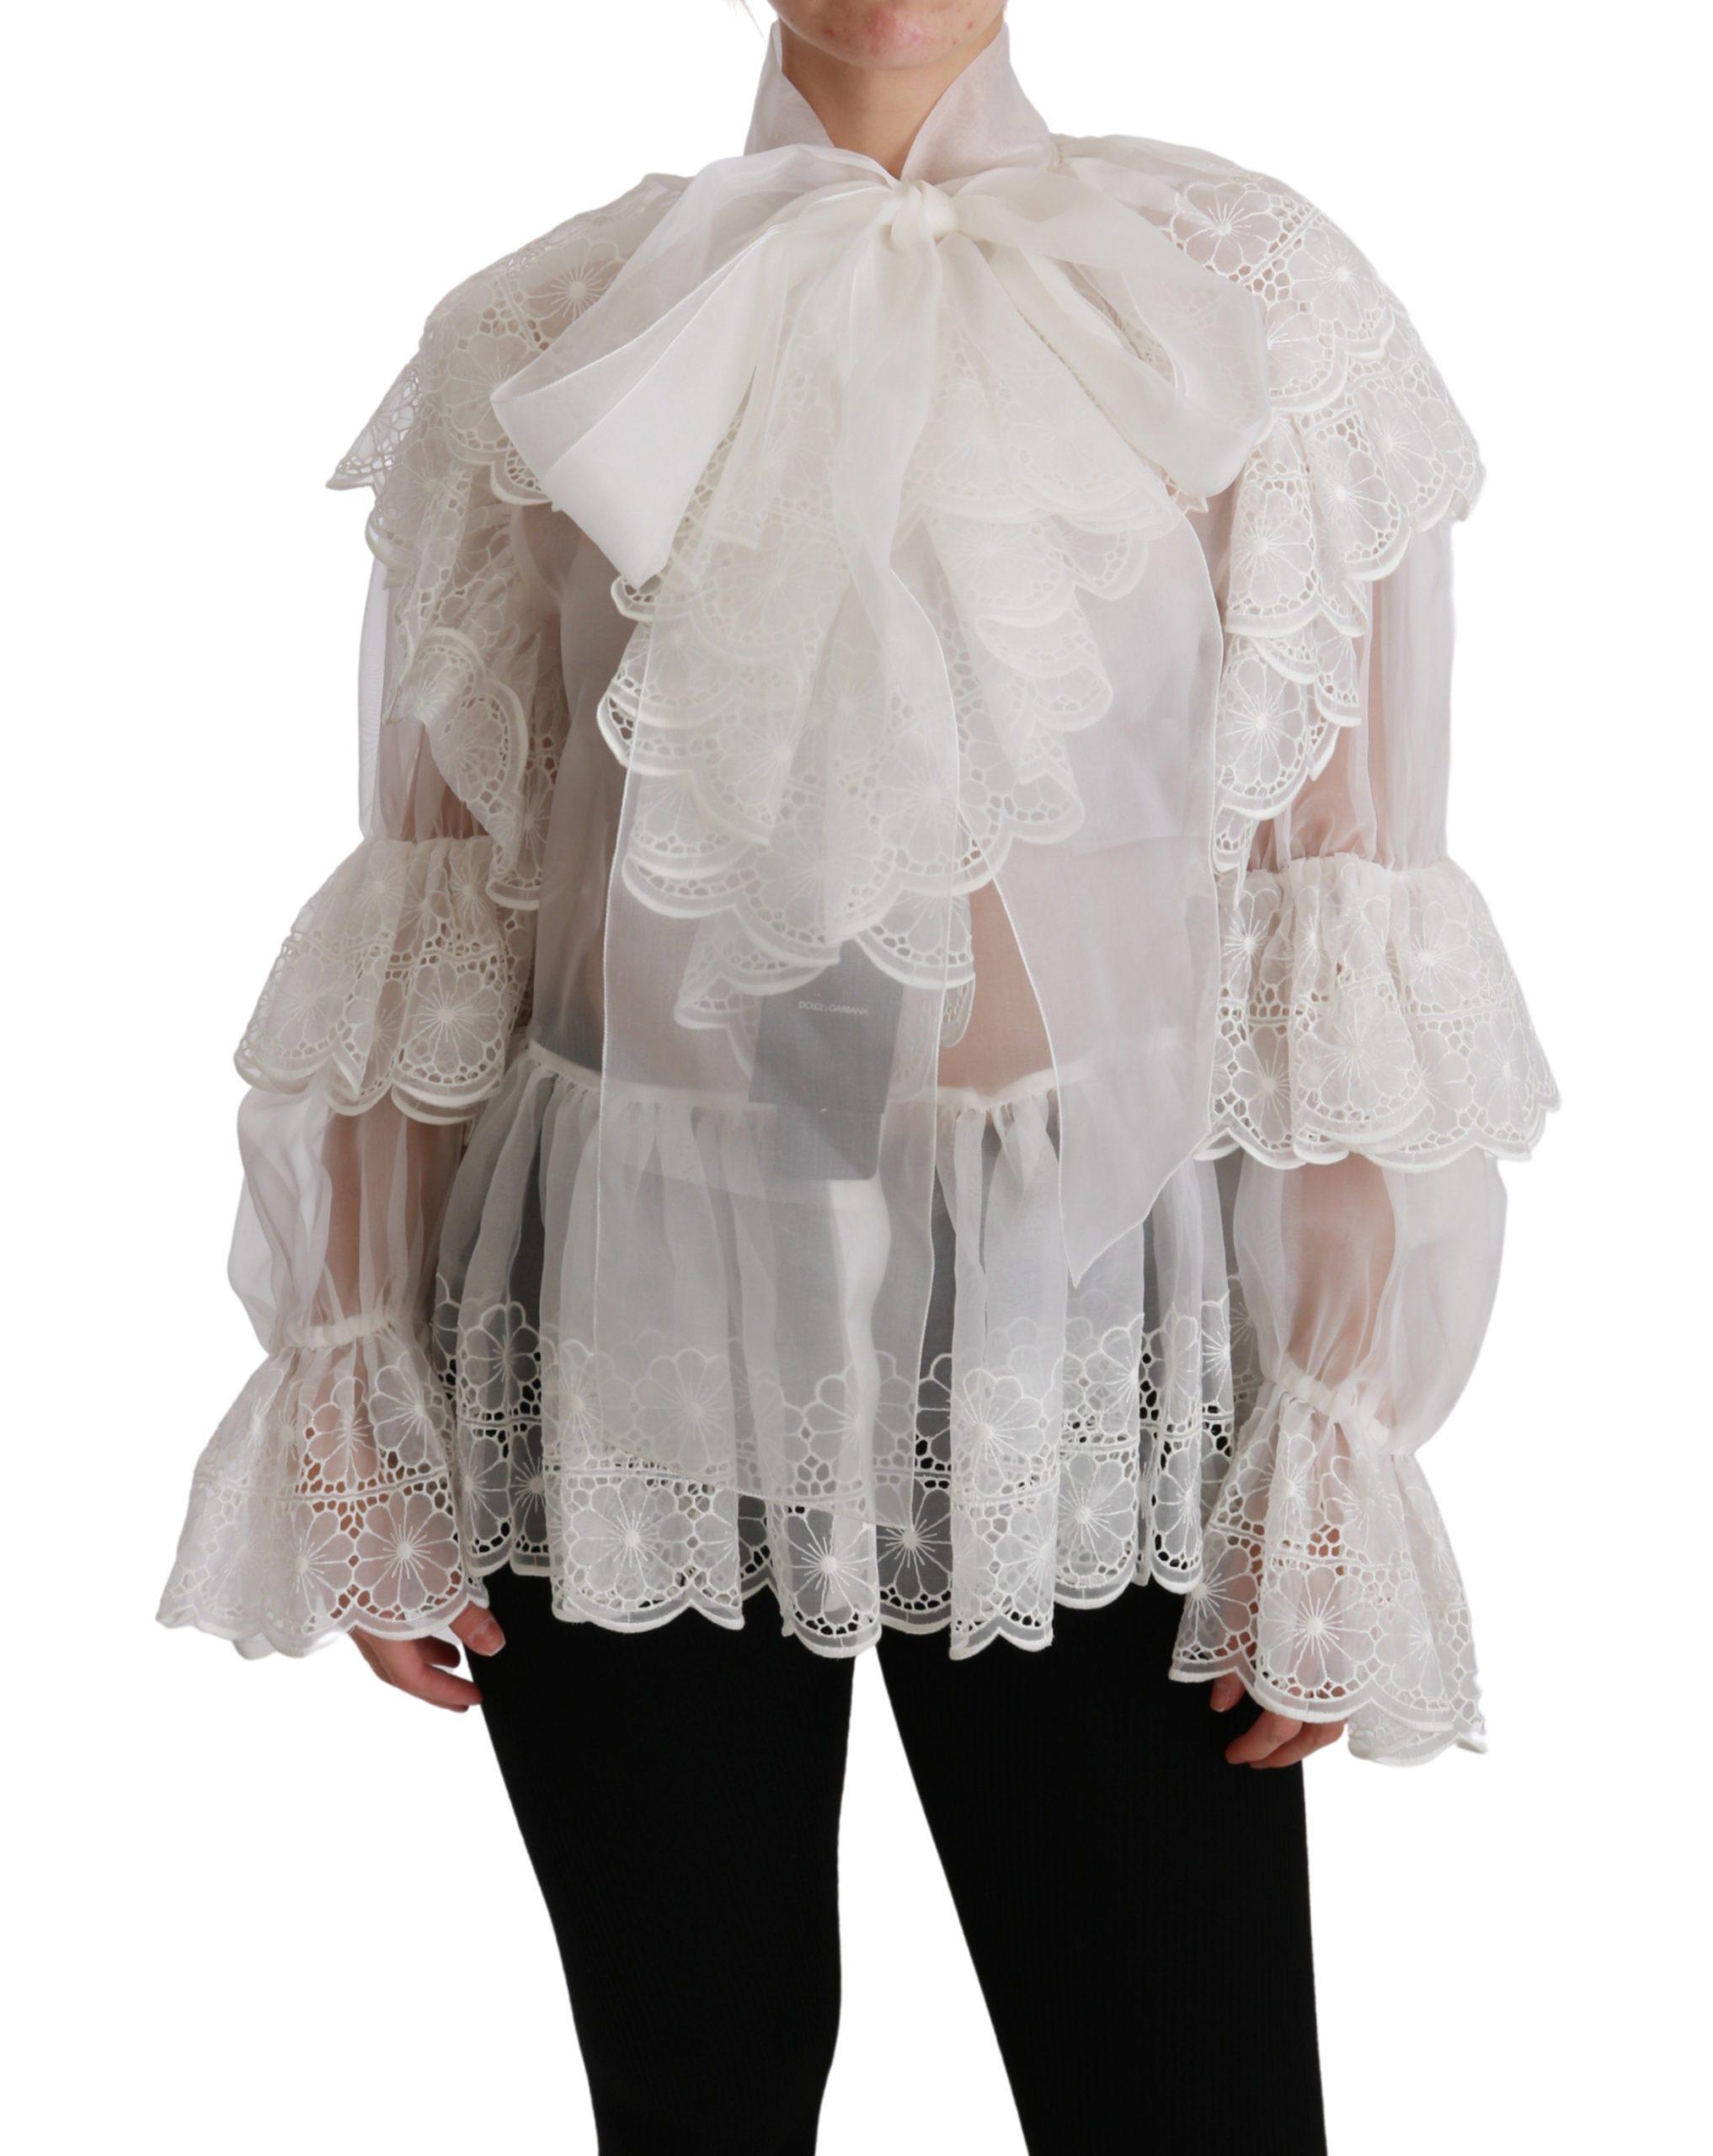 Dolce & Gabbana Women's Lace Long Sleeve Top White TSH4484 - IT40 S